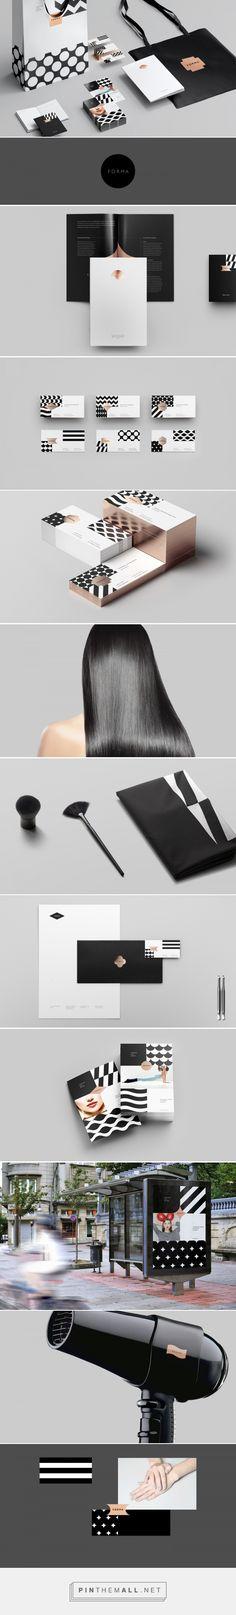 Forma Beauty Shop Branding by Sergey Tarasenko | Fivestar Branding Agency – Design and Branding Agency & Curated Inspiration Gallery